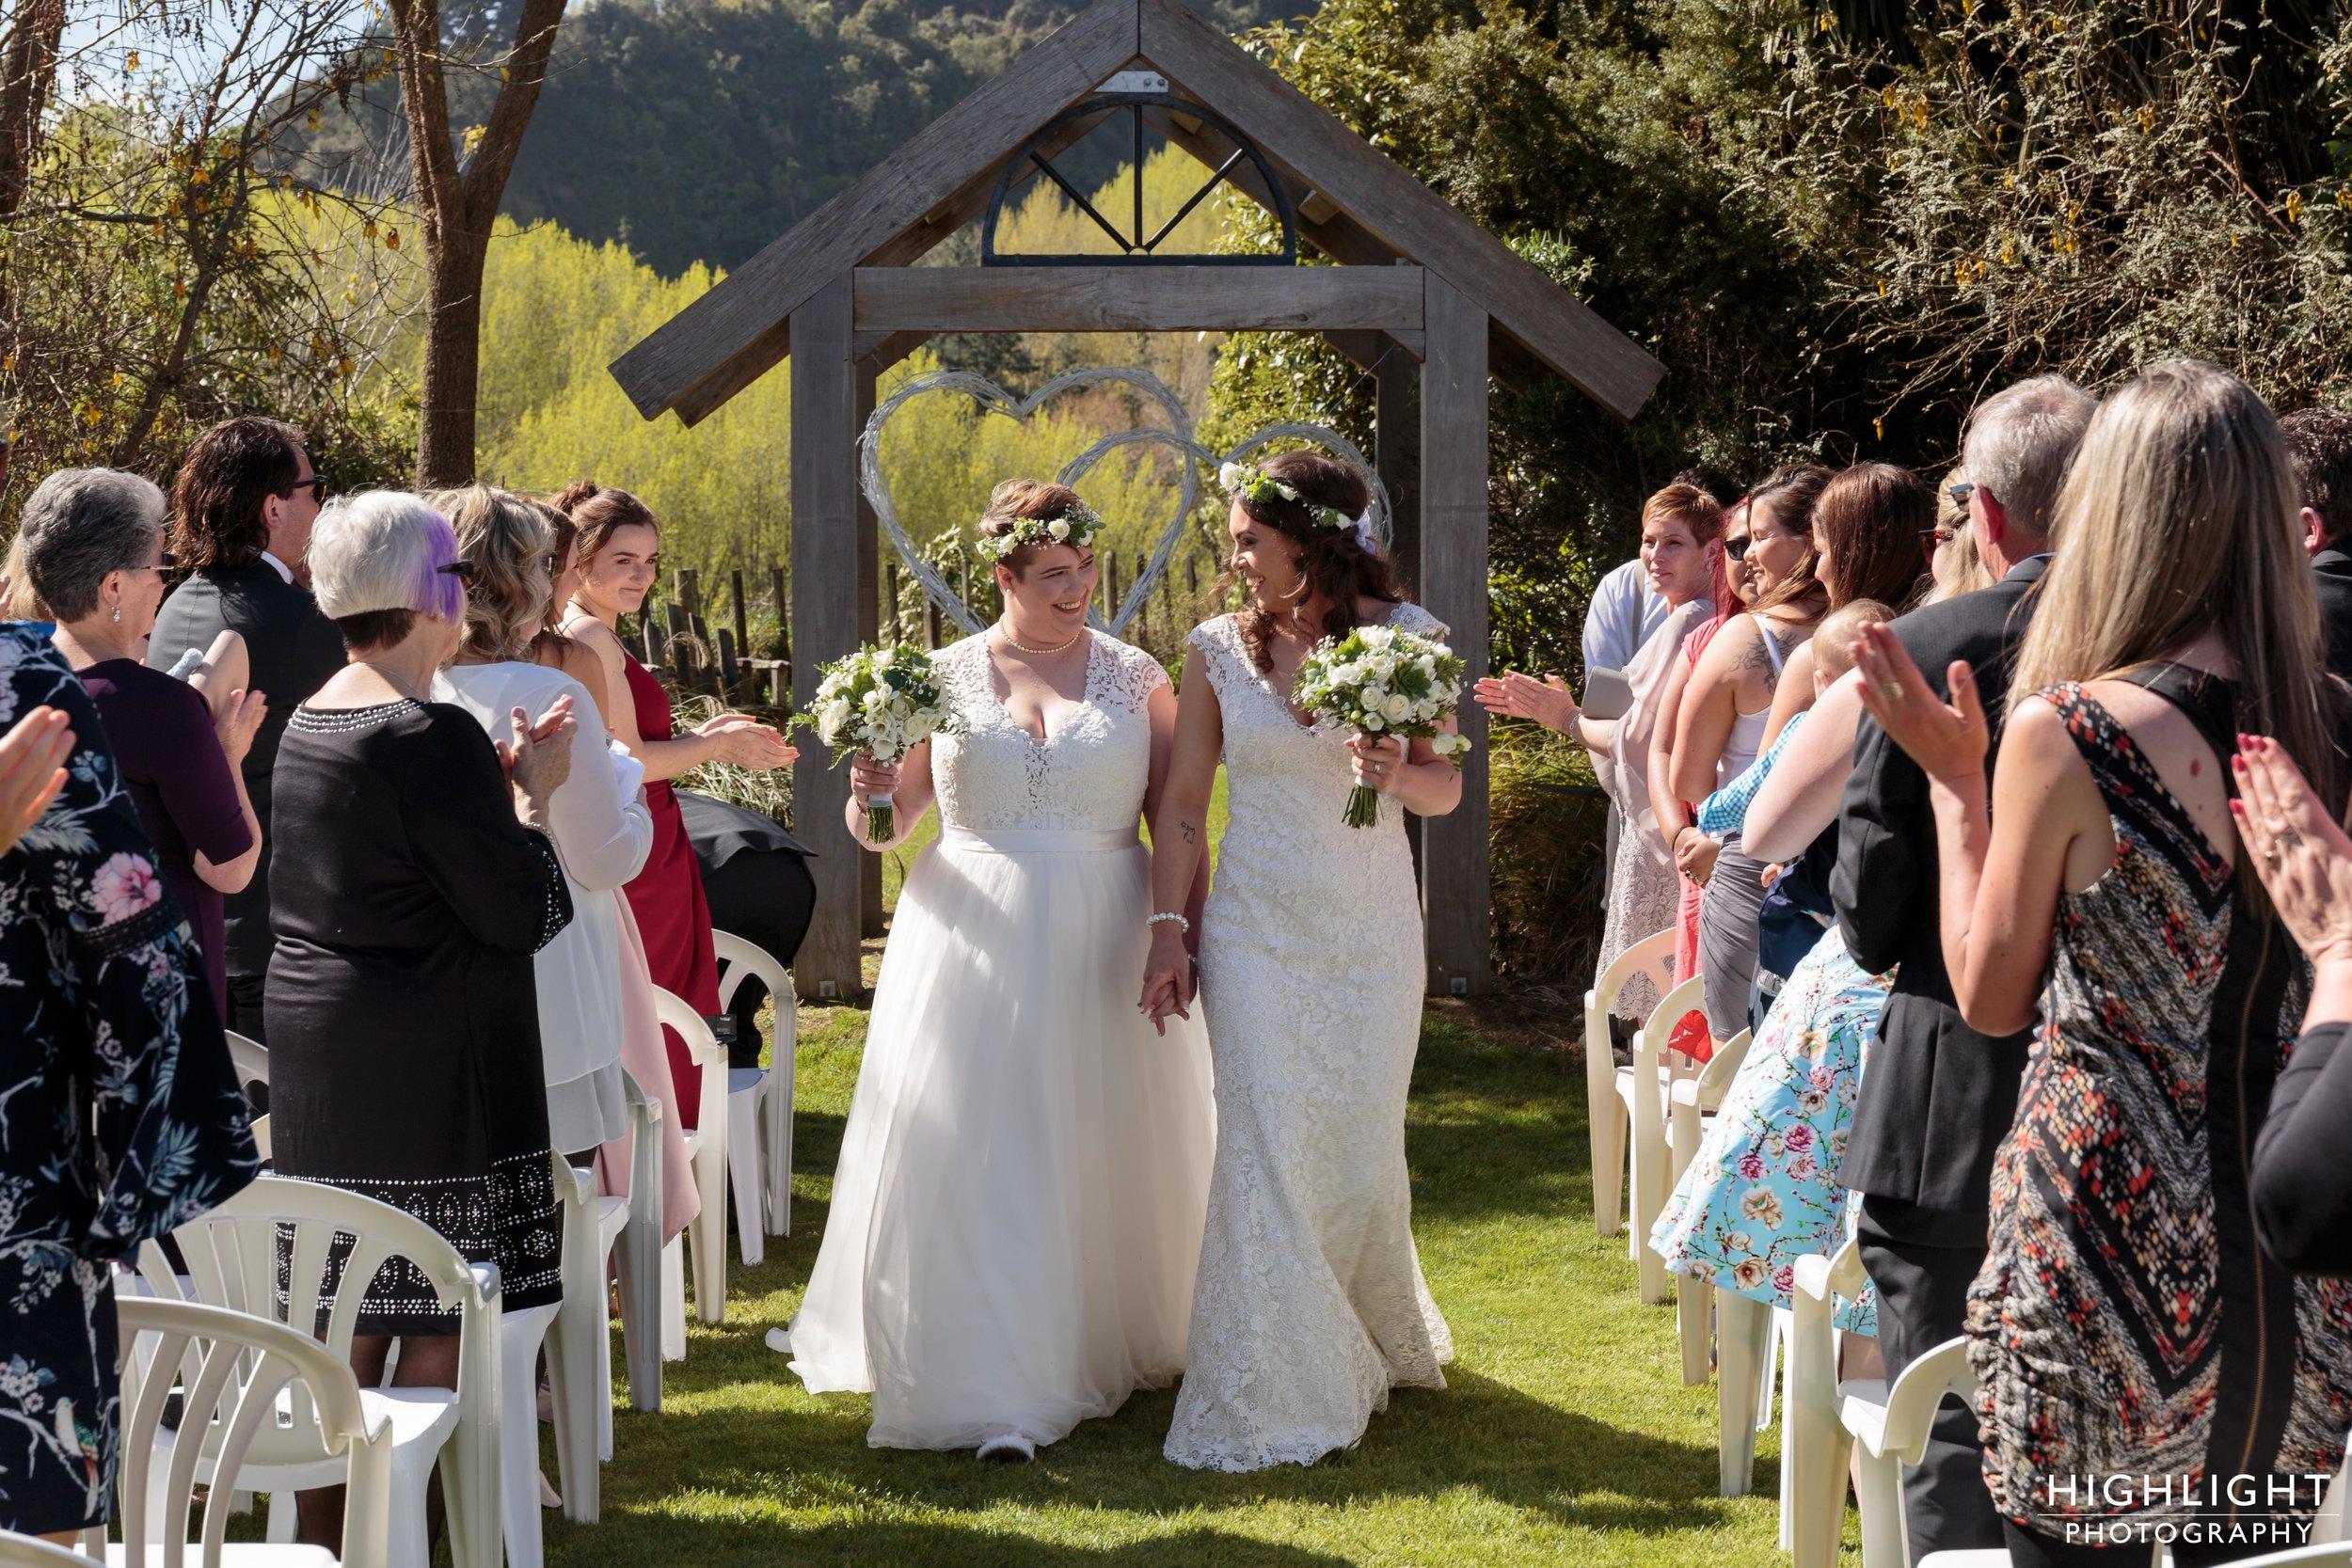 highlight_wedding_photography_makoura_lodge_manawatu_new_zealand-92.jpg